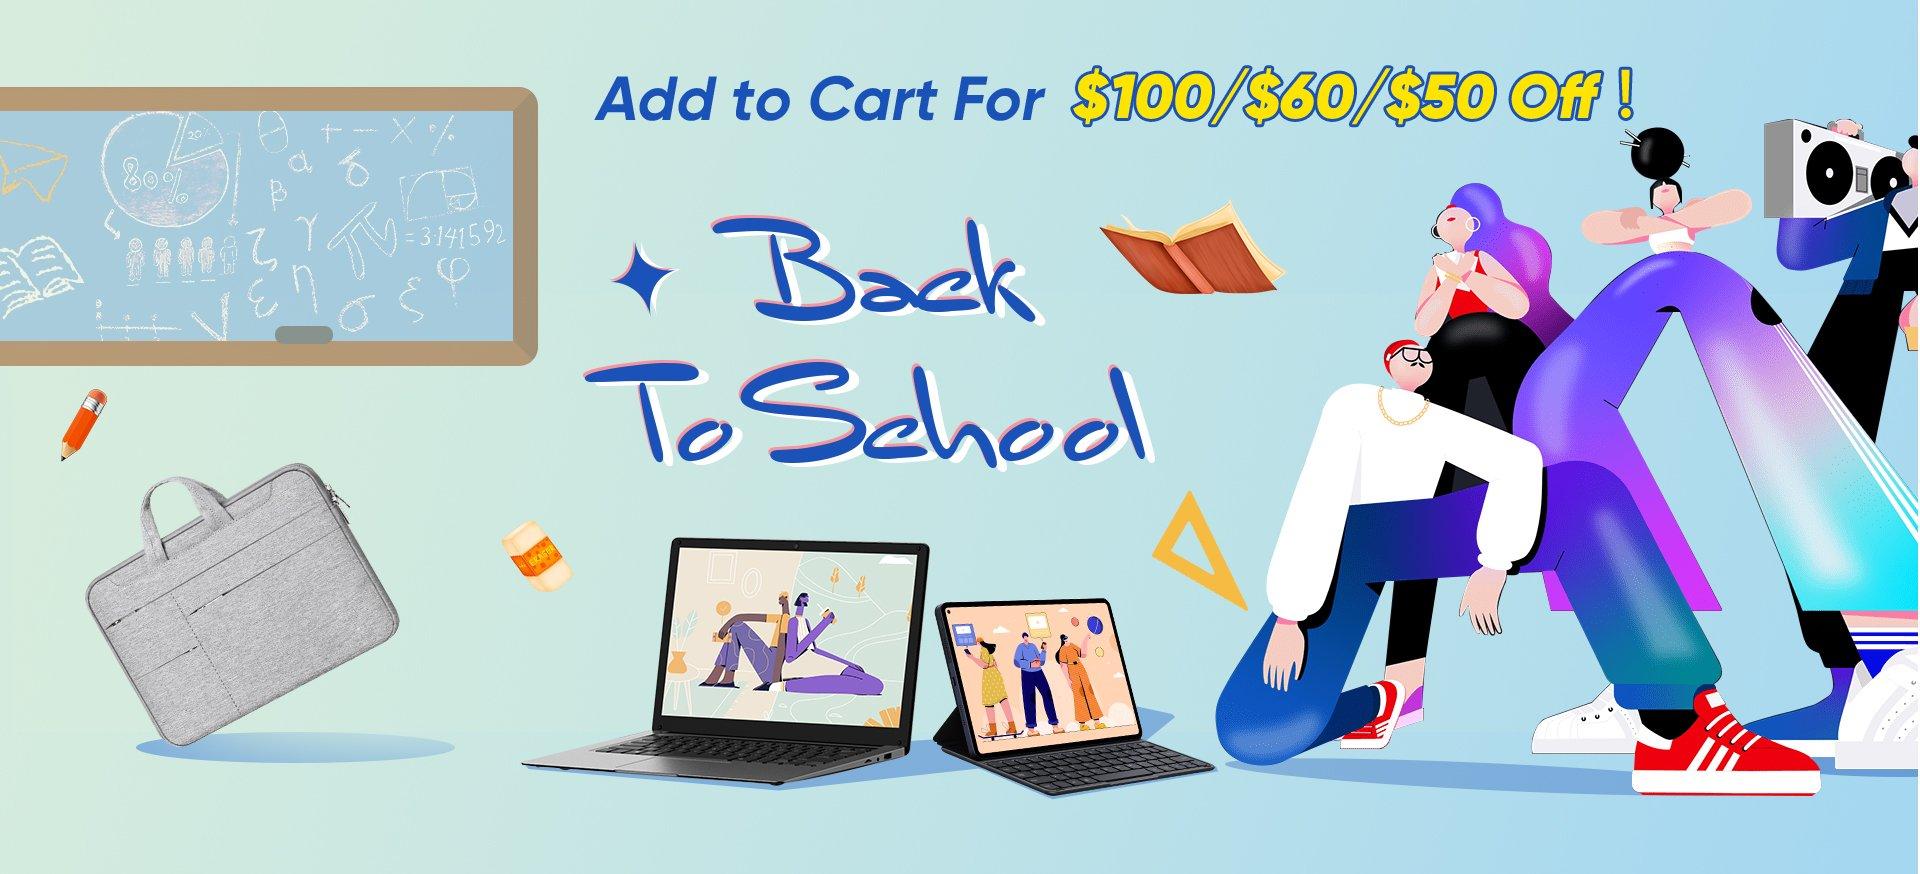 Offerte Chuwi - Back to school 2021